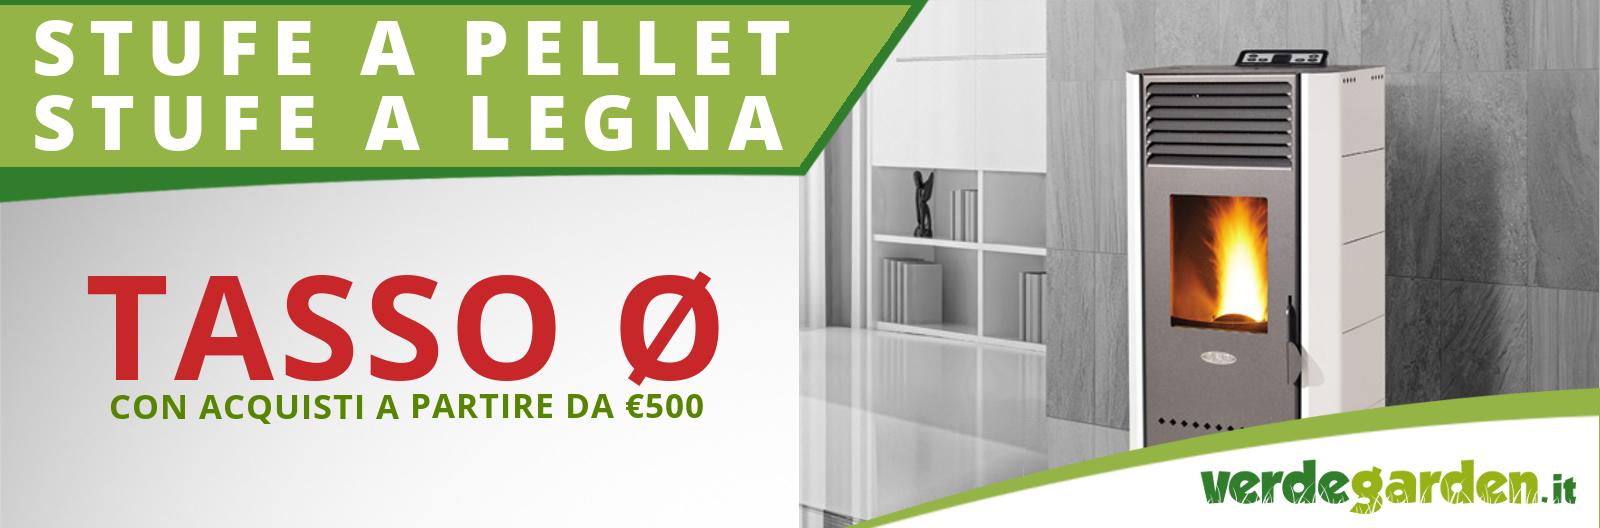 Offerte stufe in vendita su verdegarden - Elledi stufe a pellet ...